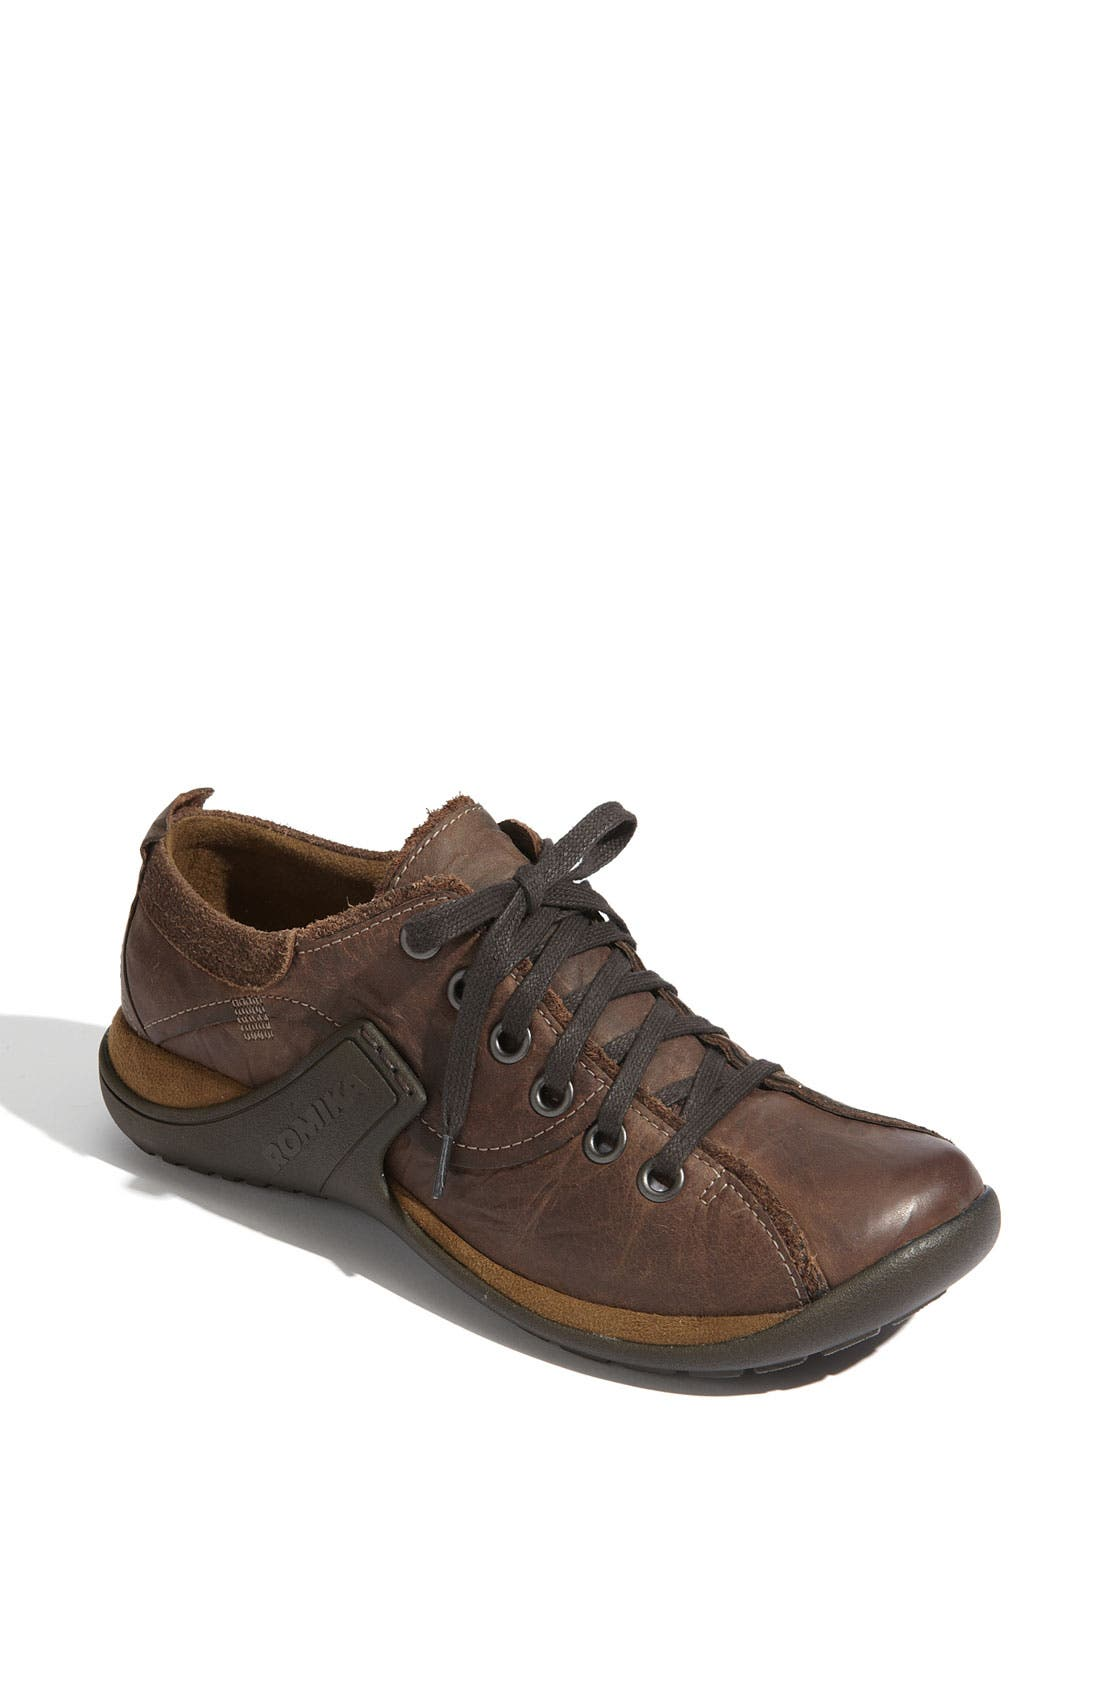 Main Image - Romika® 'Milla 62' Sneaker